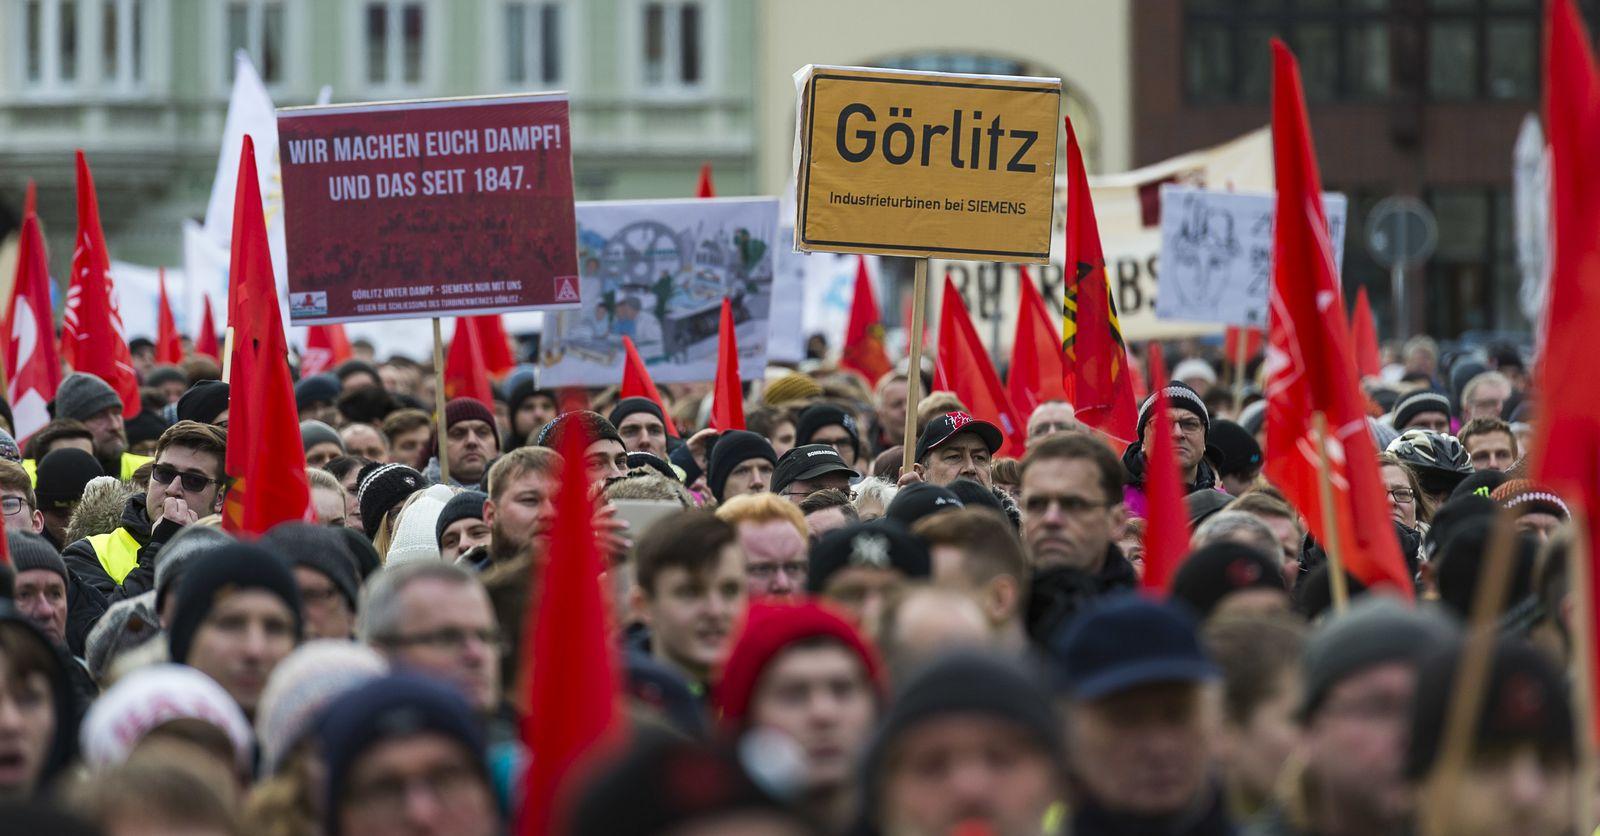 Demo Görlitz Siemens